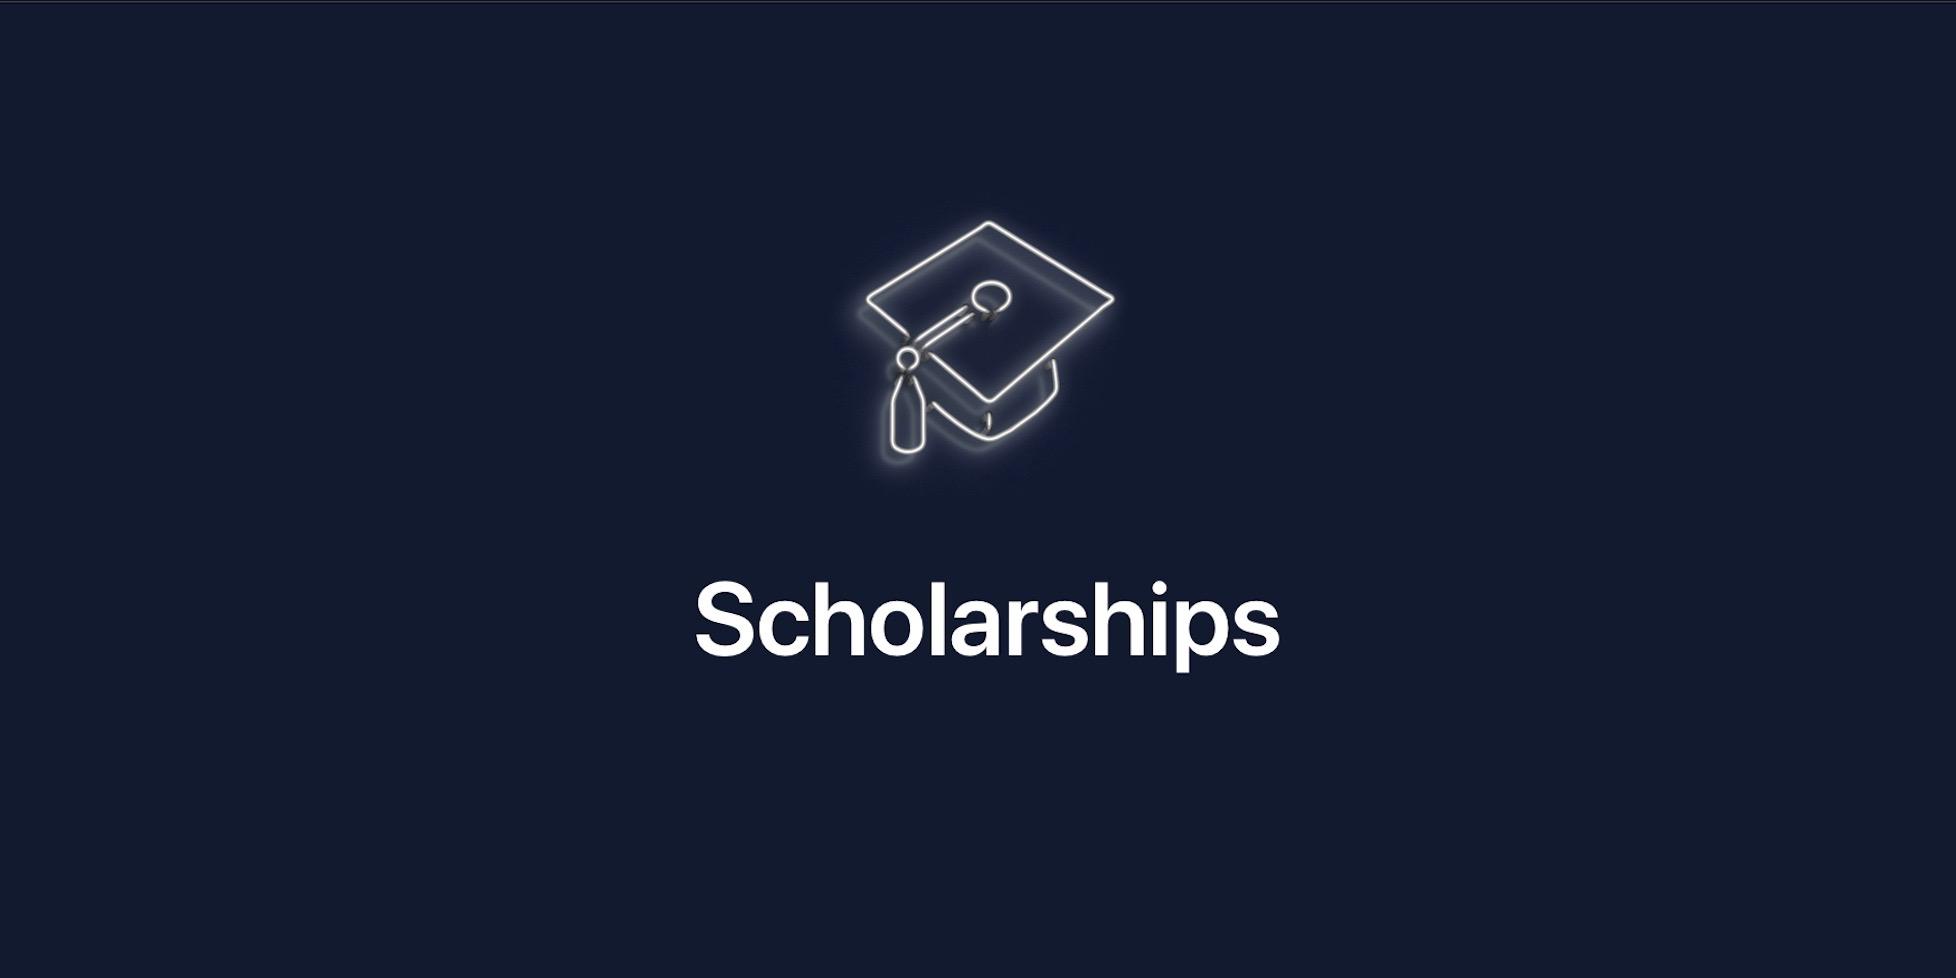 Apple notifying WWDC 2019 scholarship applicants of award status